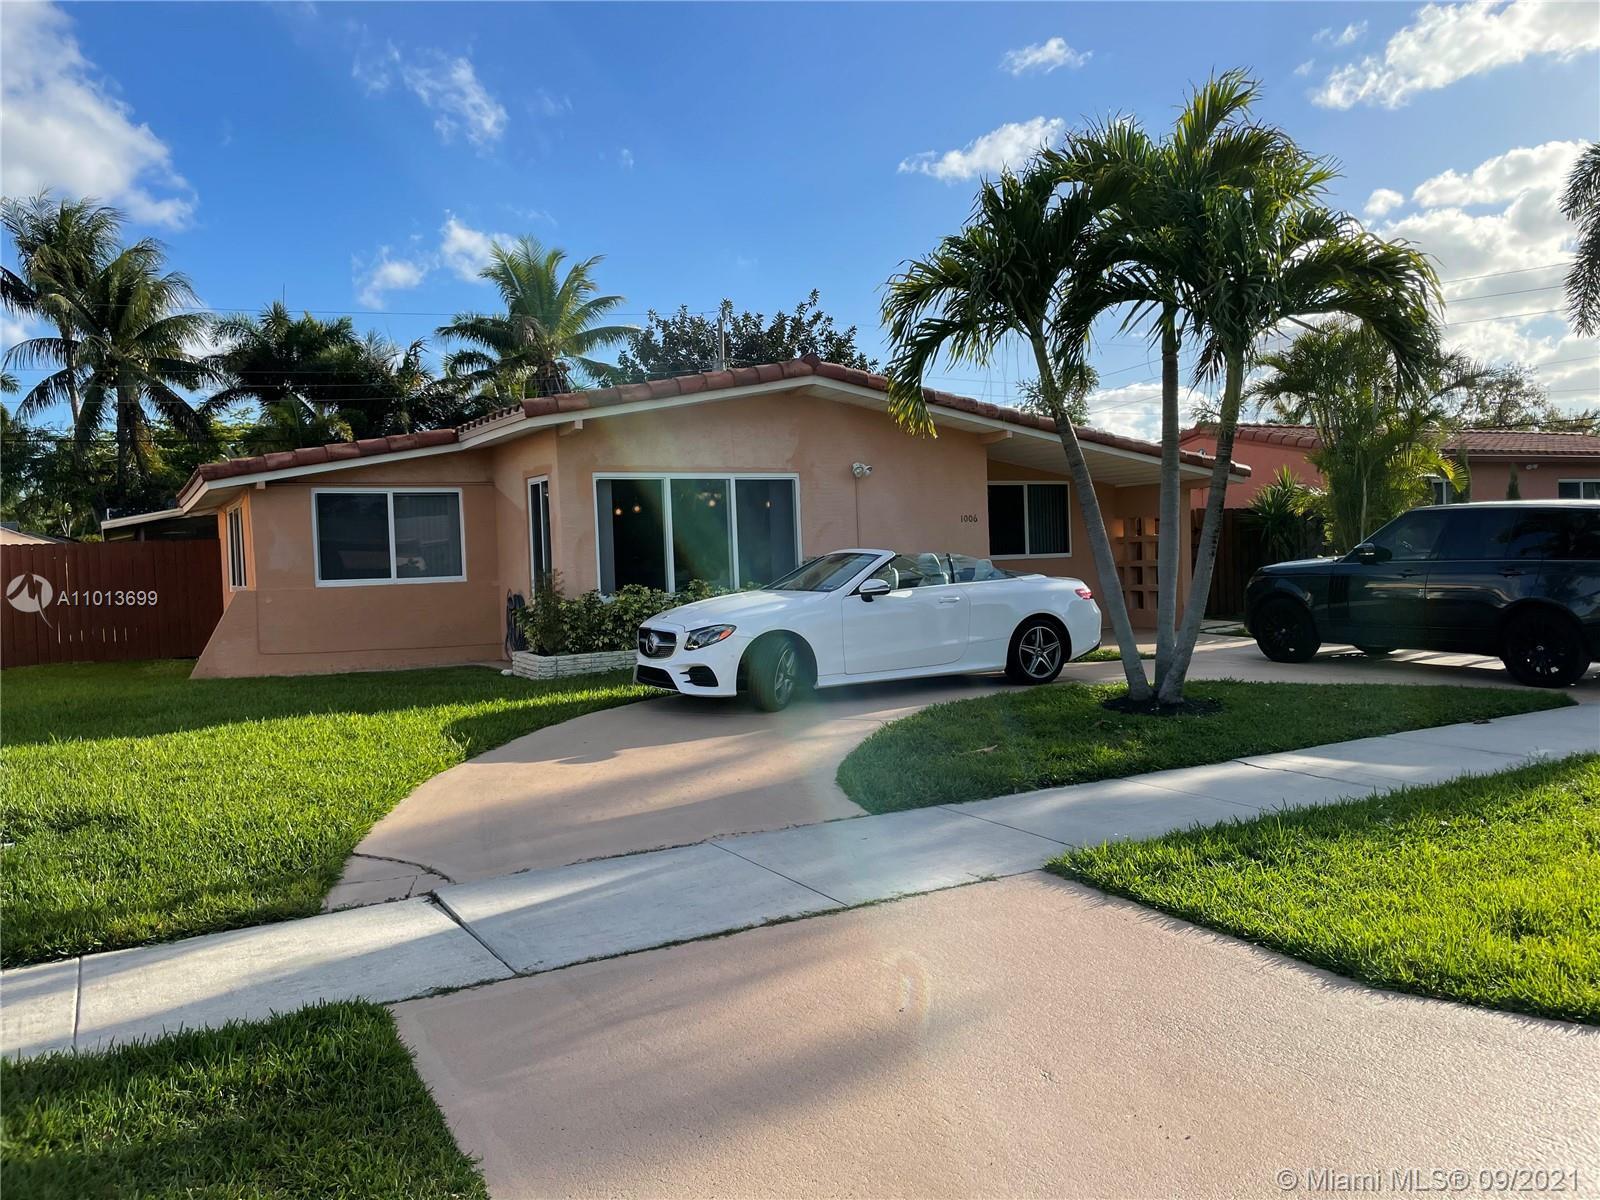 Gulfstream Estates - 1006 NE 6th St, Hallandale Beach, FL 33009